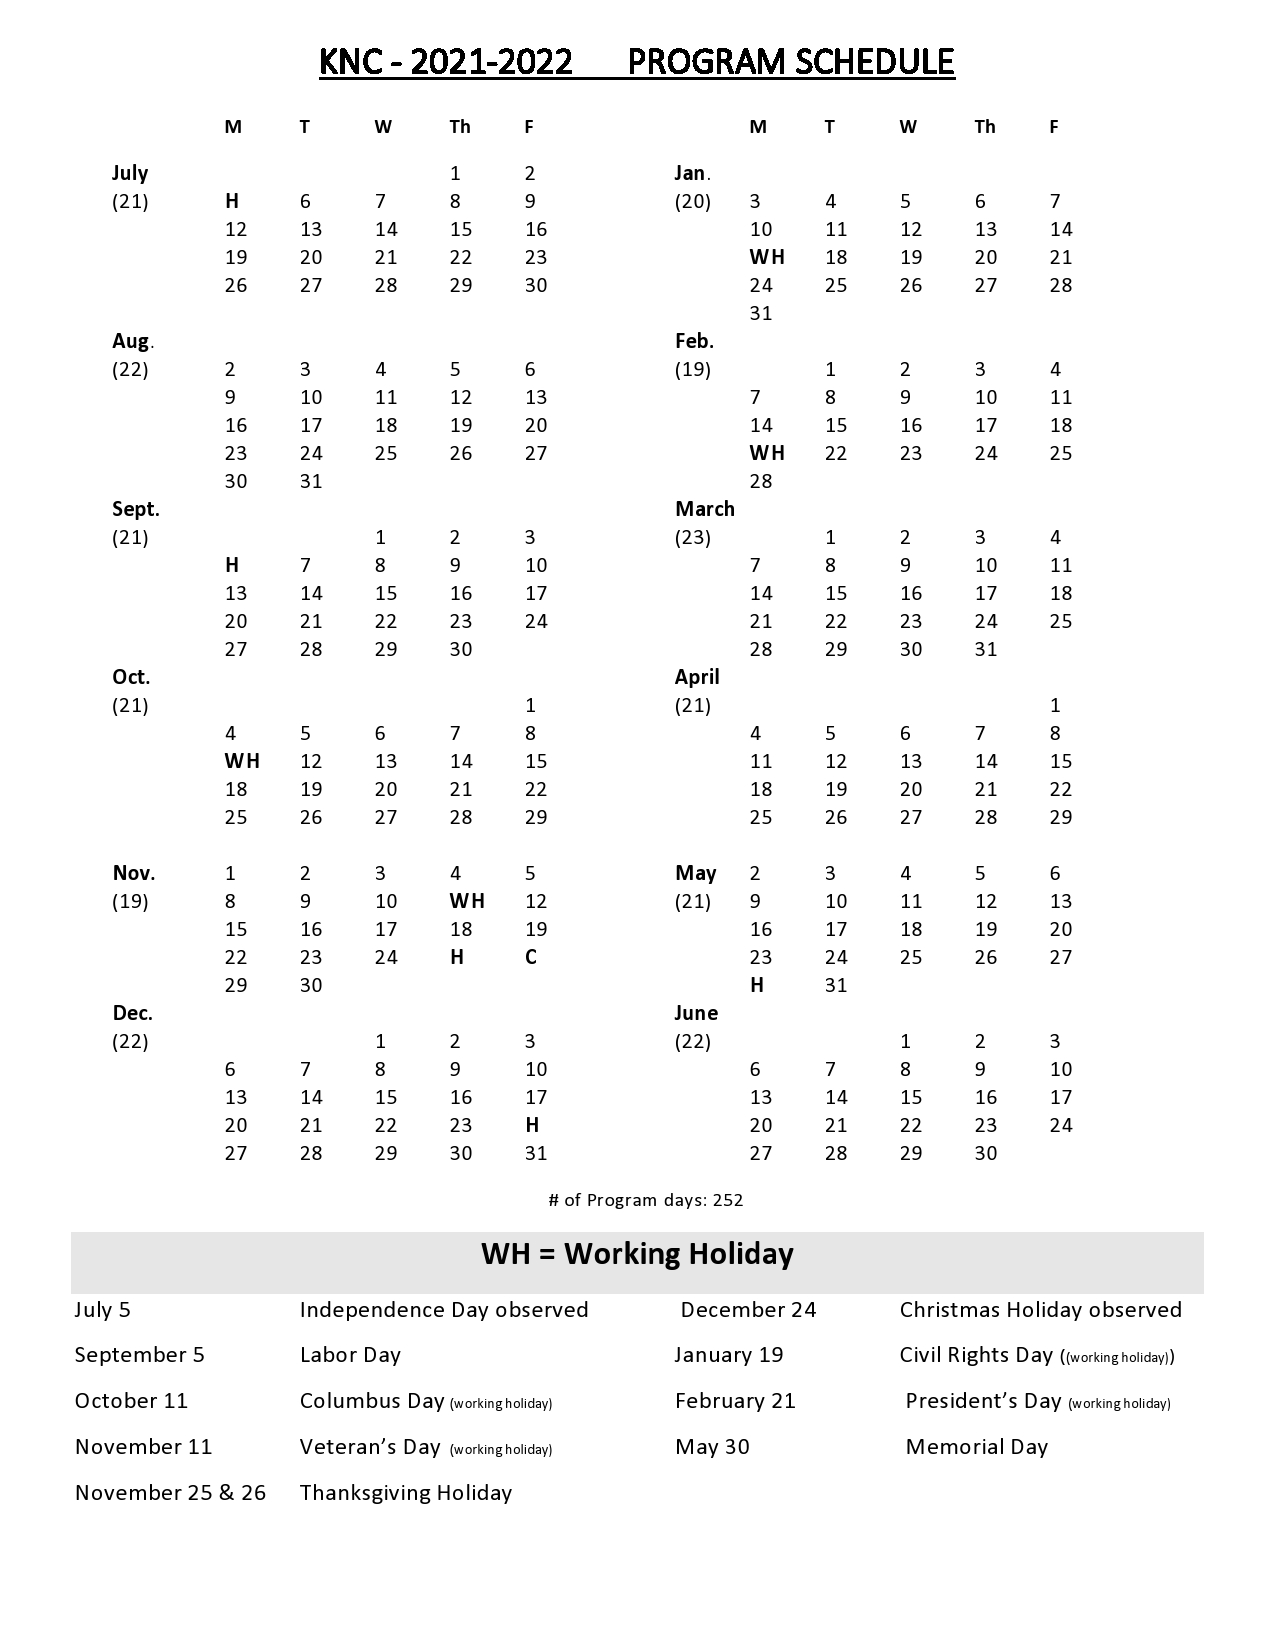 Program Schedule 2021-2022-page0001